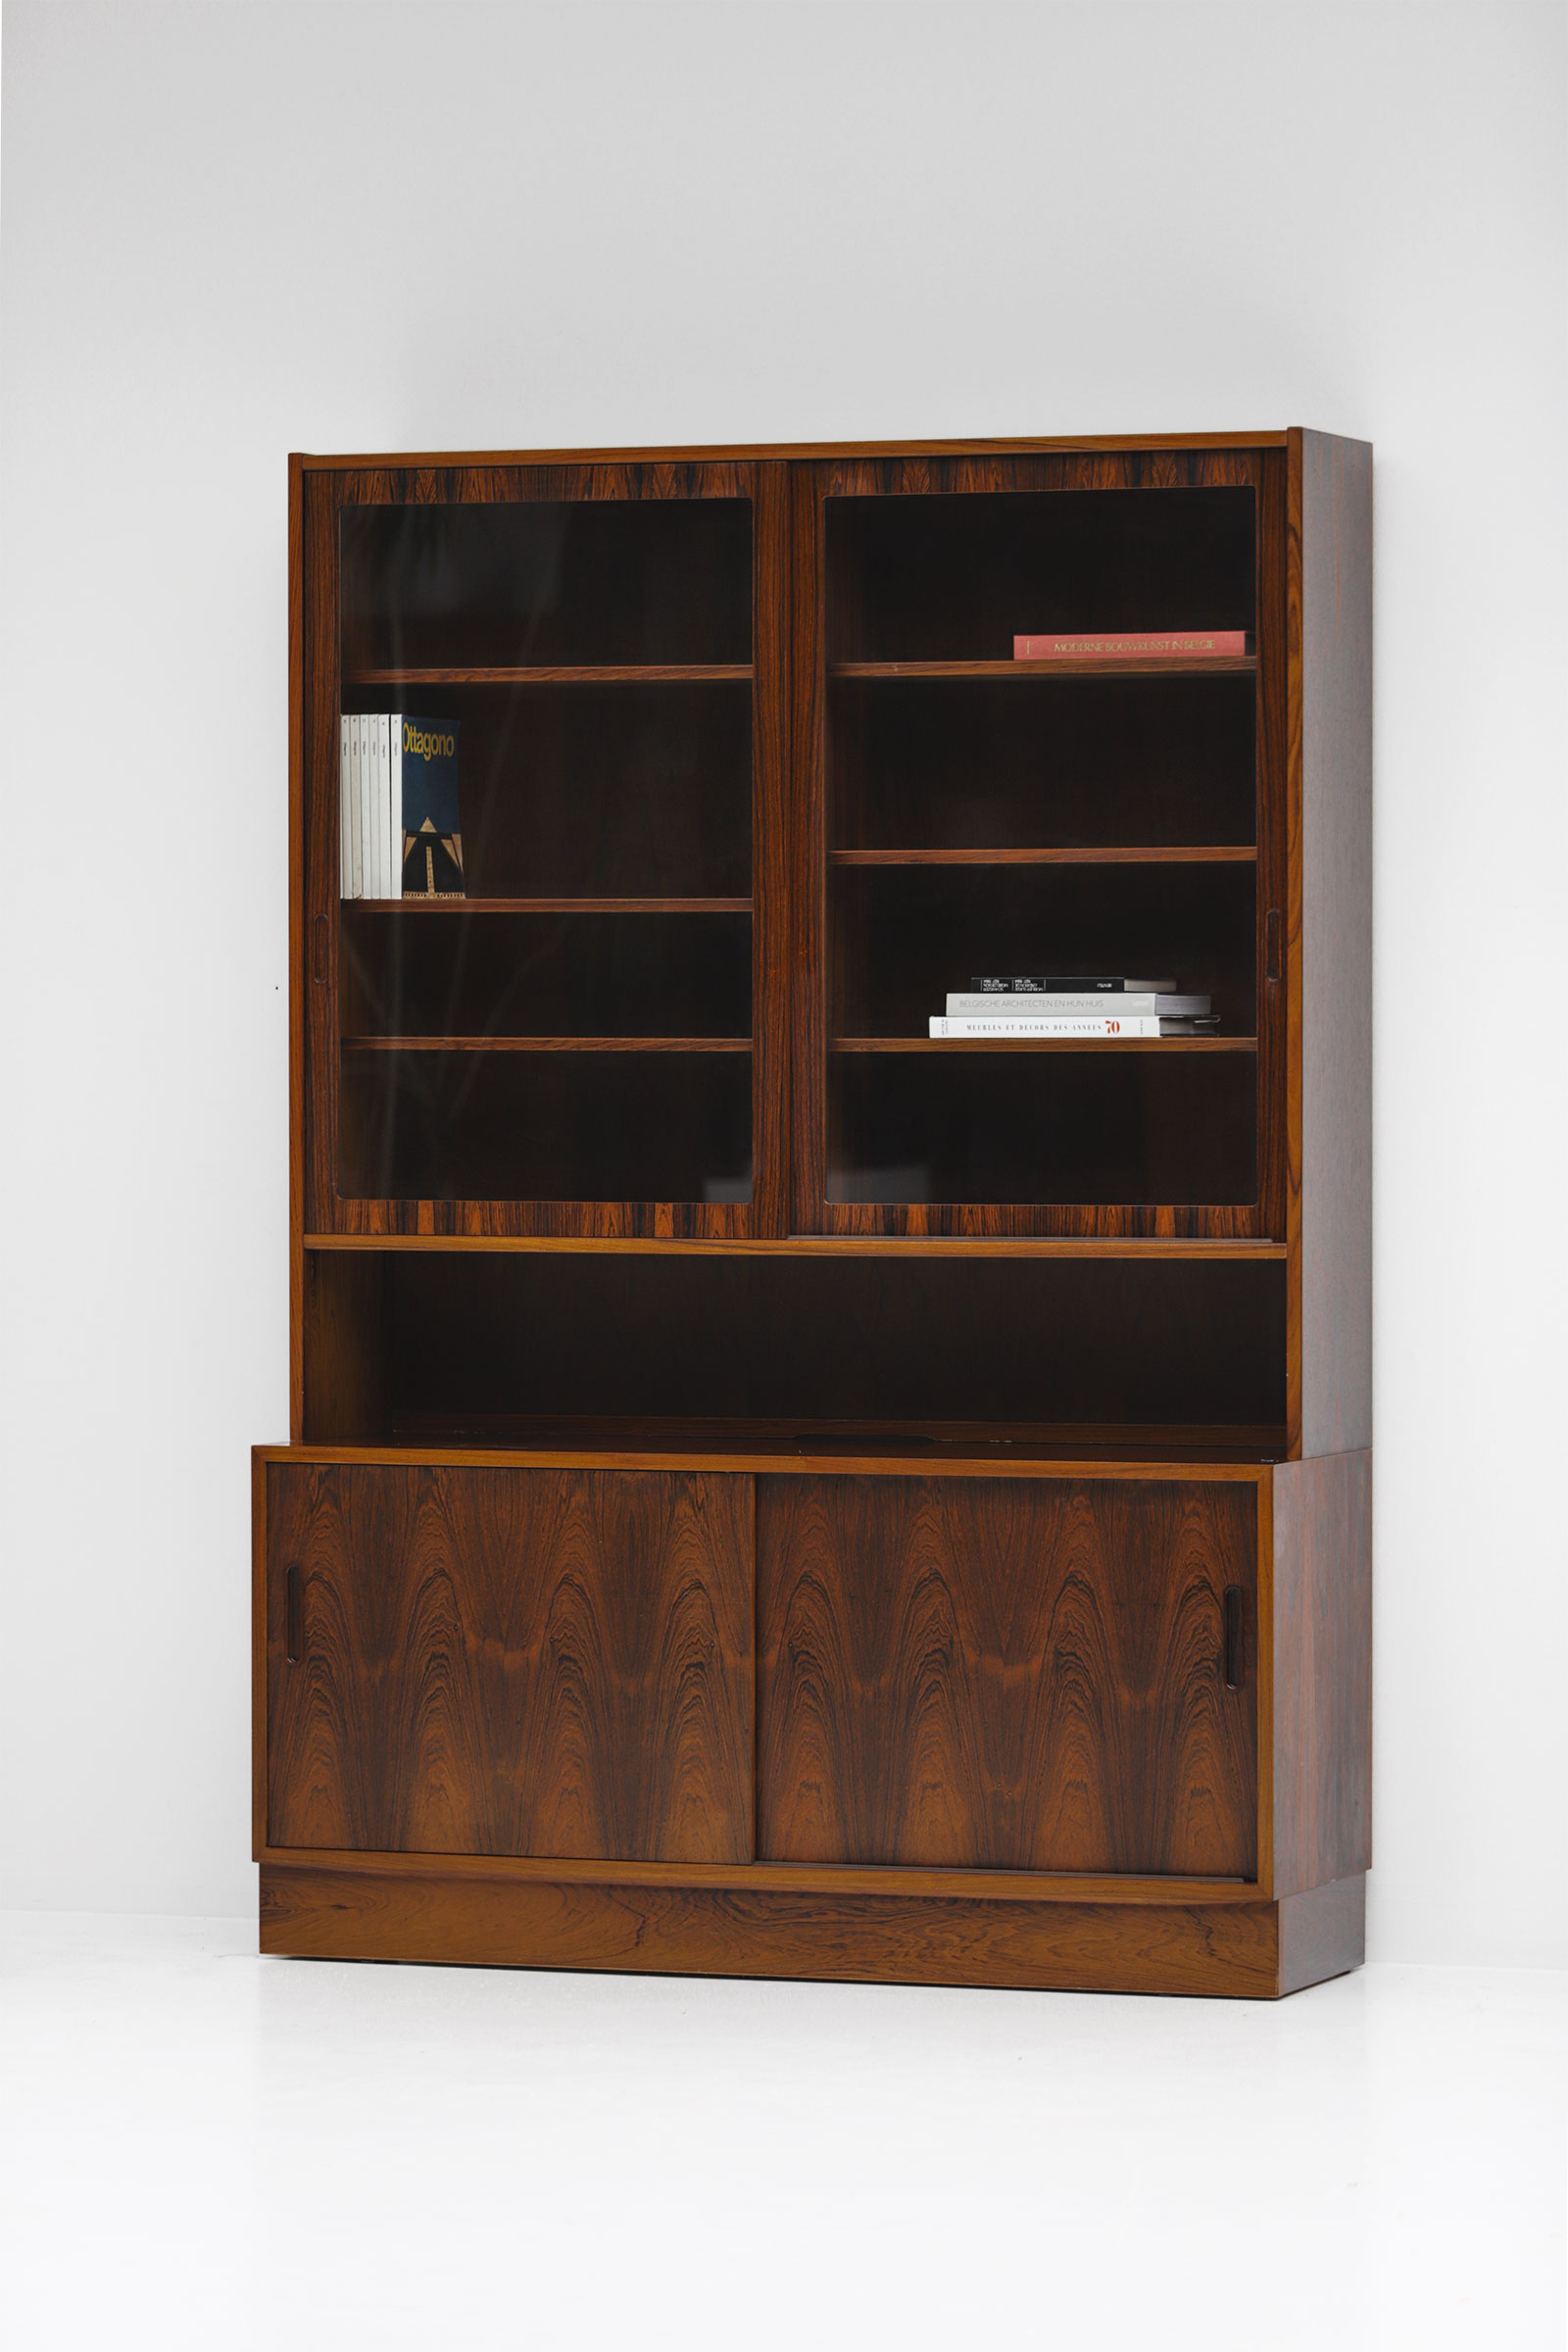 cabinet by Erik Brouer for Mobelfabrik 1960image 2